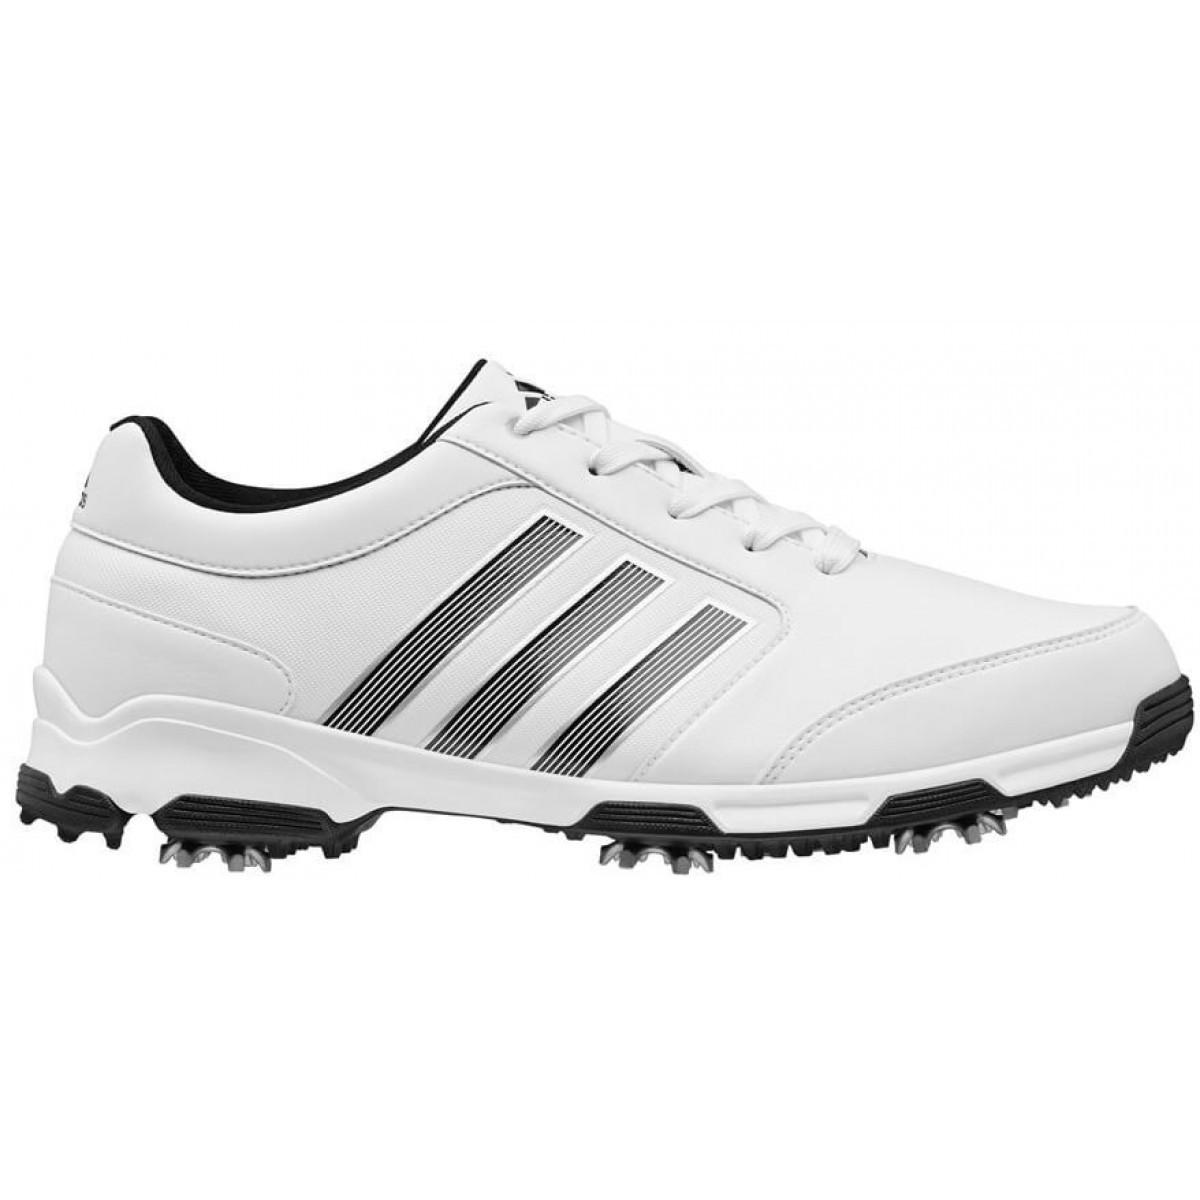 Negro 9m 360 Y Hombre Zapatos Adidas Pure Lite Blanco Nwp Yf7gy6bv